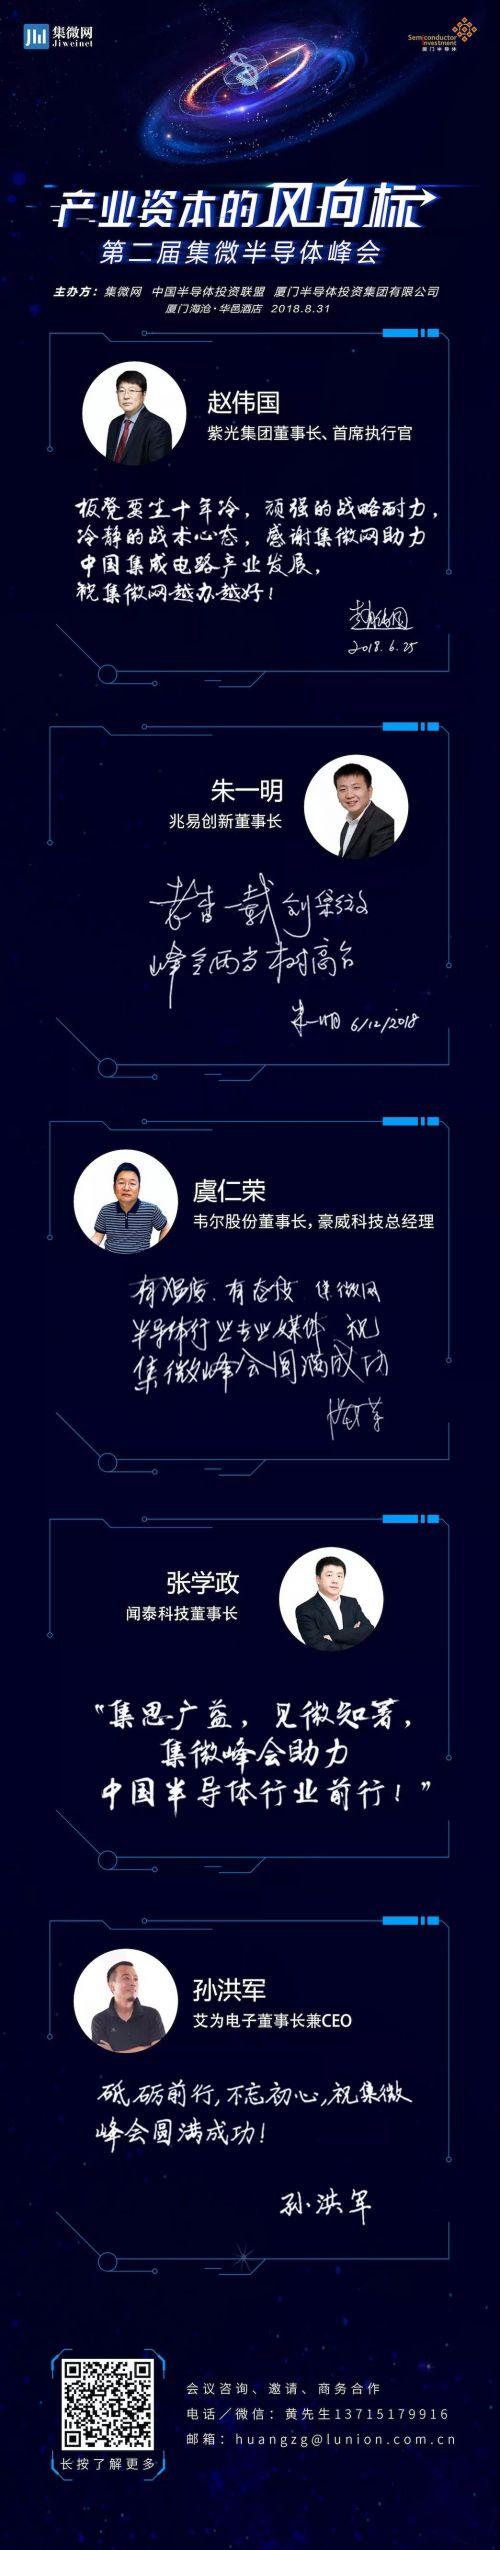 Arm吴雄昂、黄汪、石磊、张世龙、林永育寄语峰会16